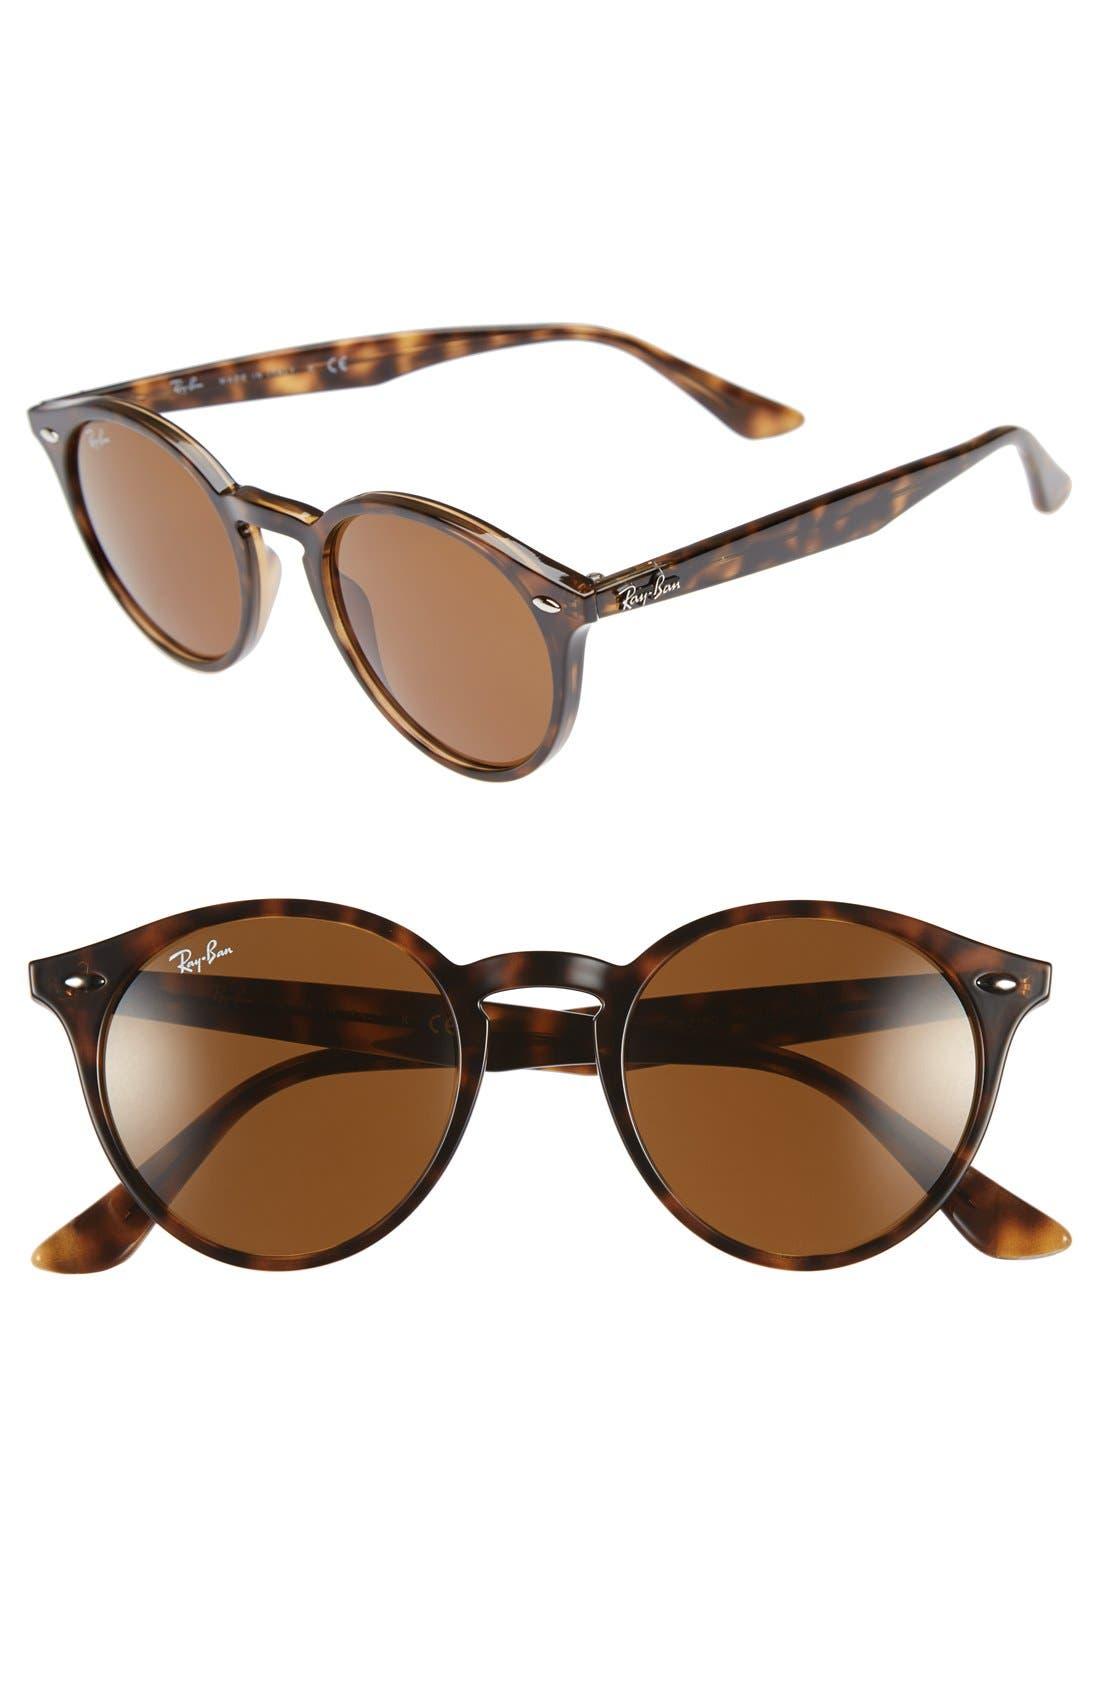 RAY-BAN Highstreet 49mm Round Sunglasses, Main, color, DARK HAVANA